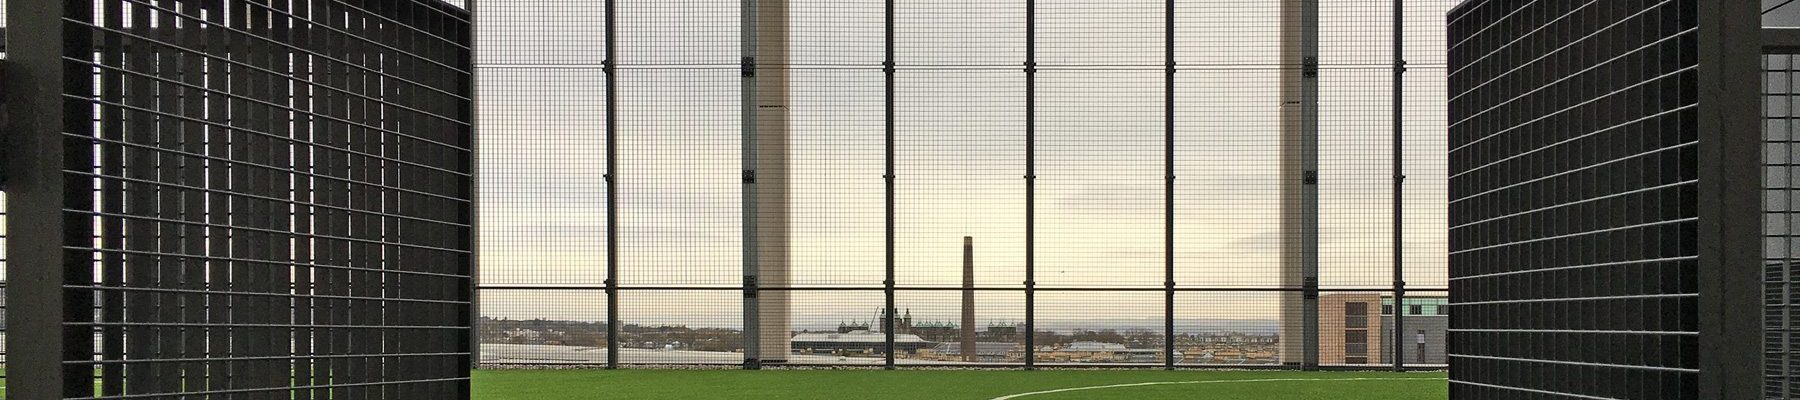 school roof-top MUGA ball court grating screen